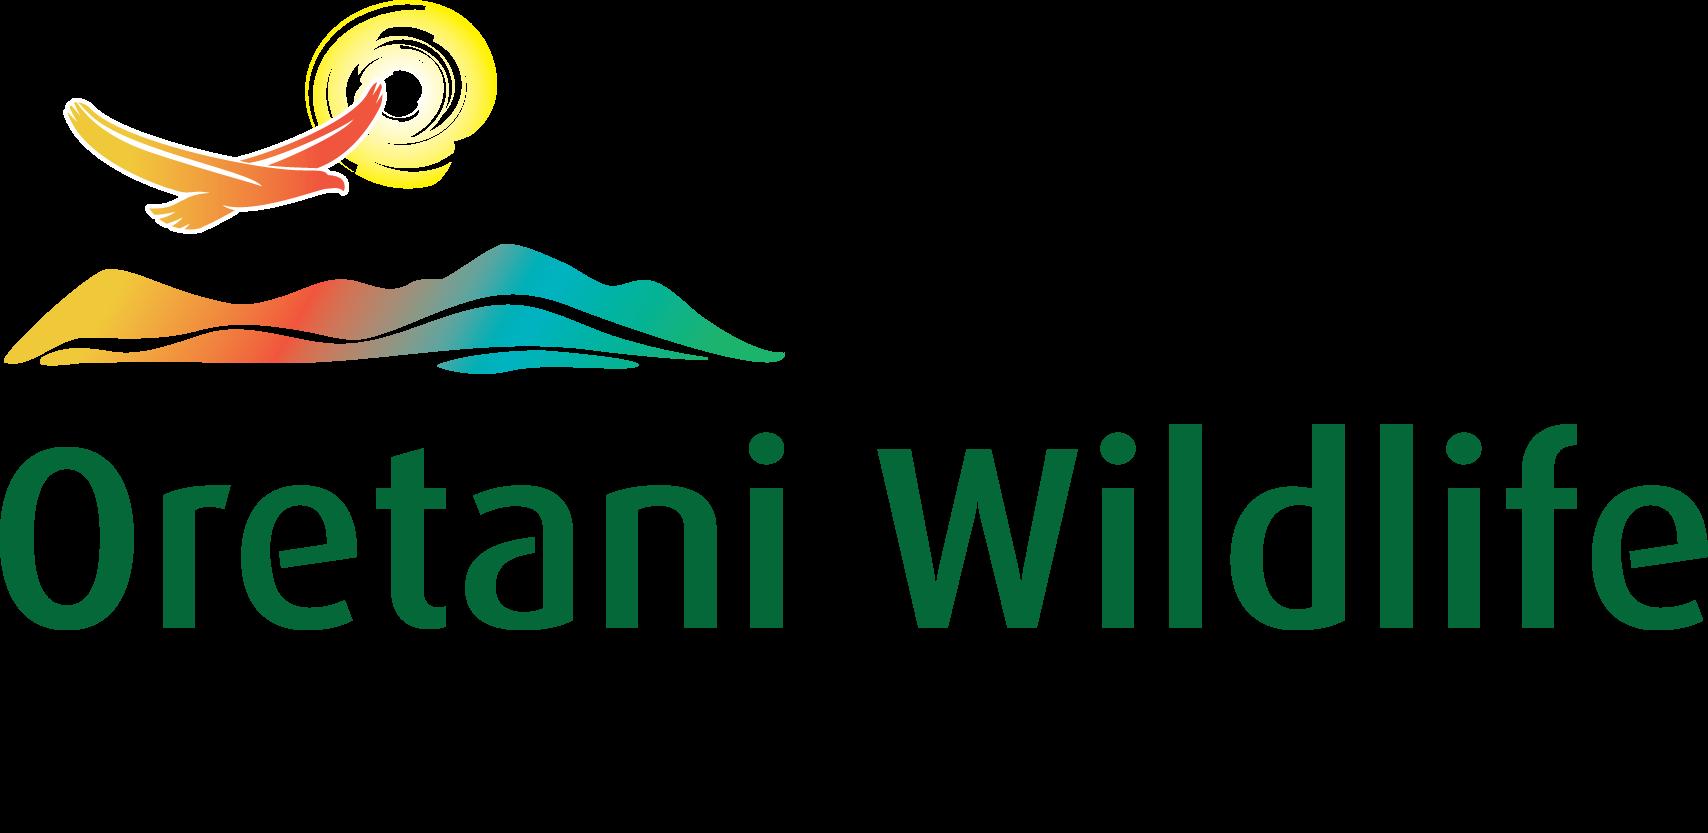 Oretani wildlife logo